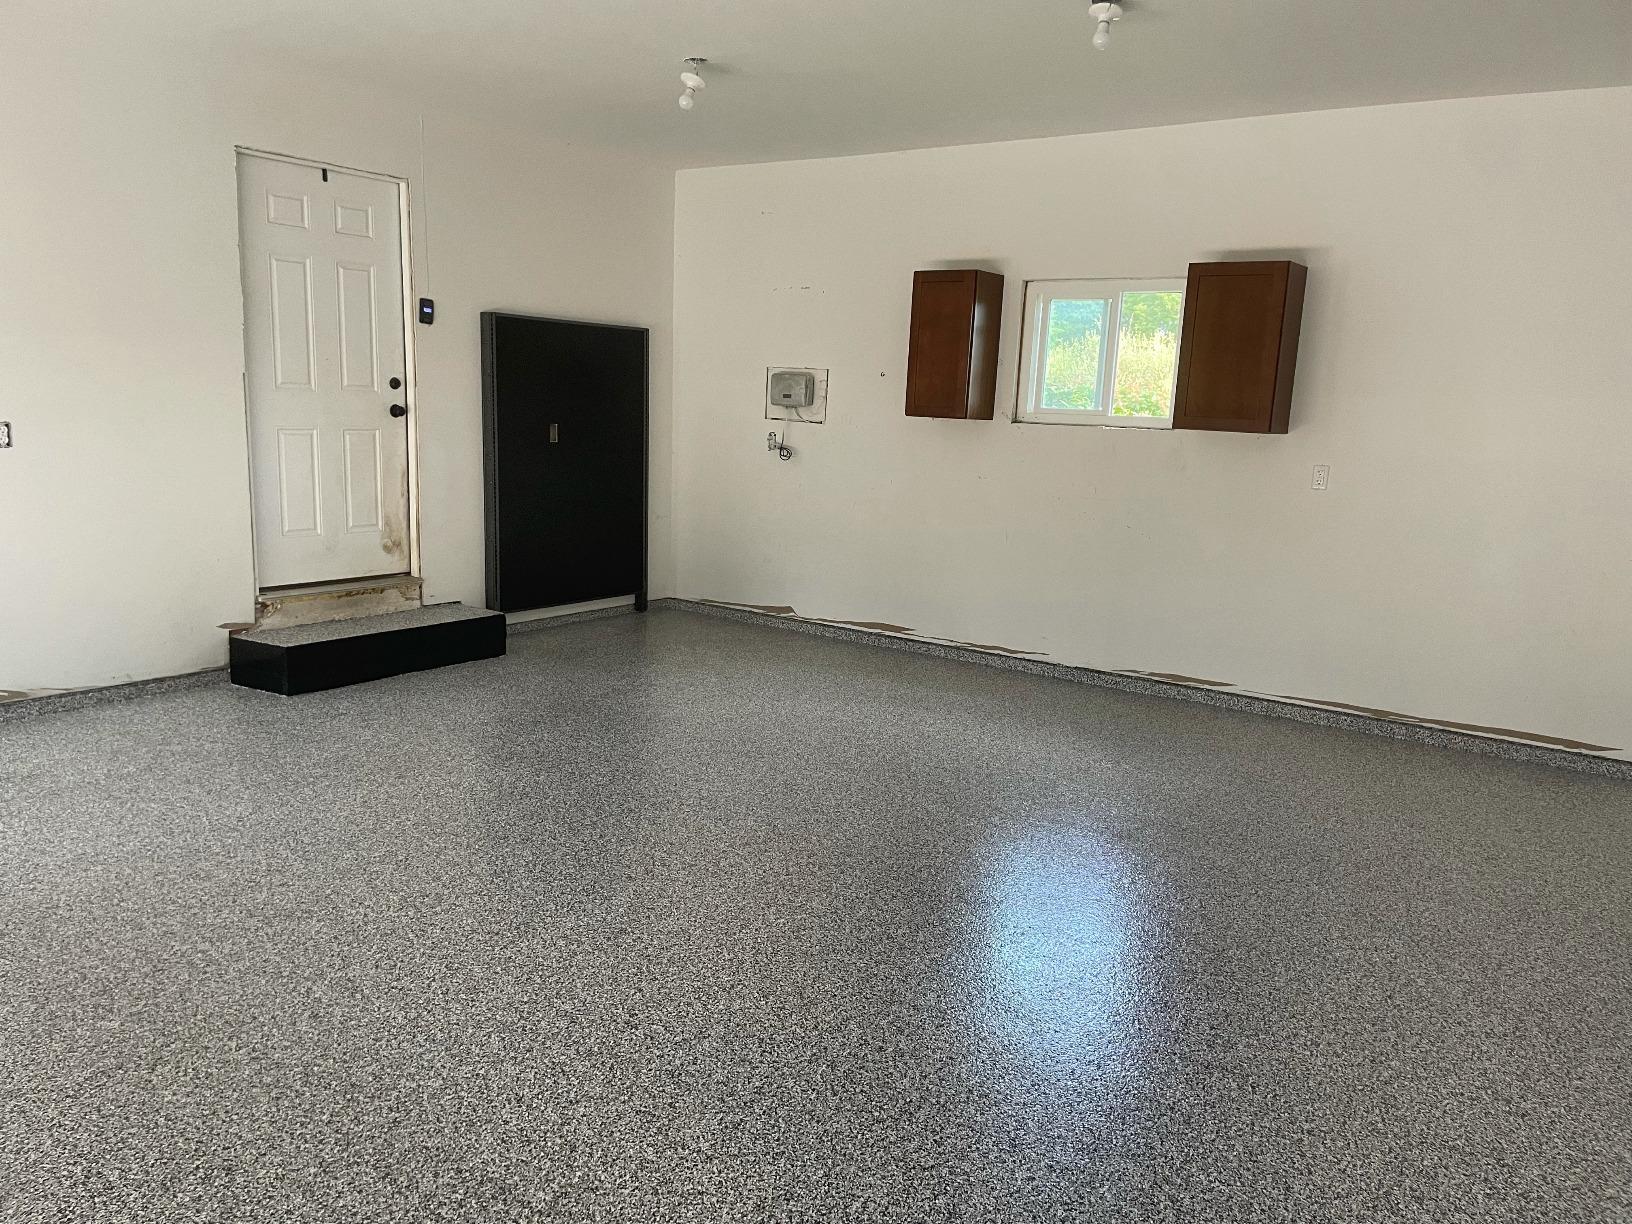 Sprucing Up A Middleville Garage Floor - After Photo